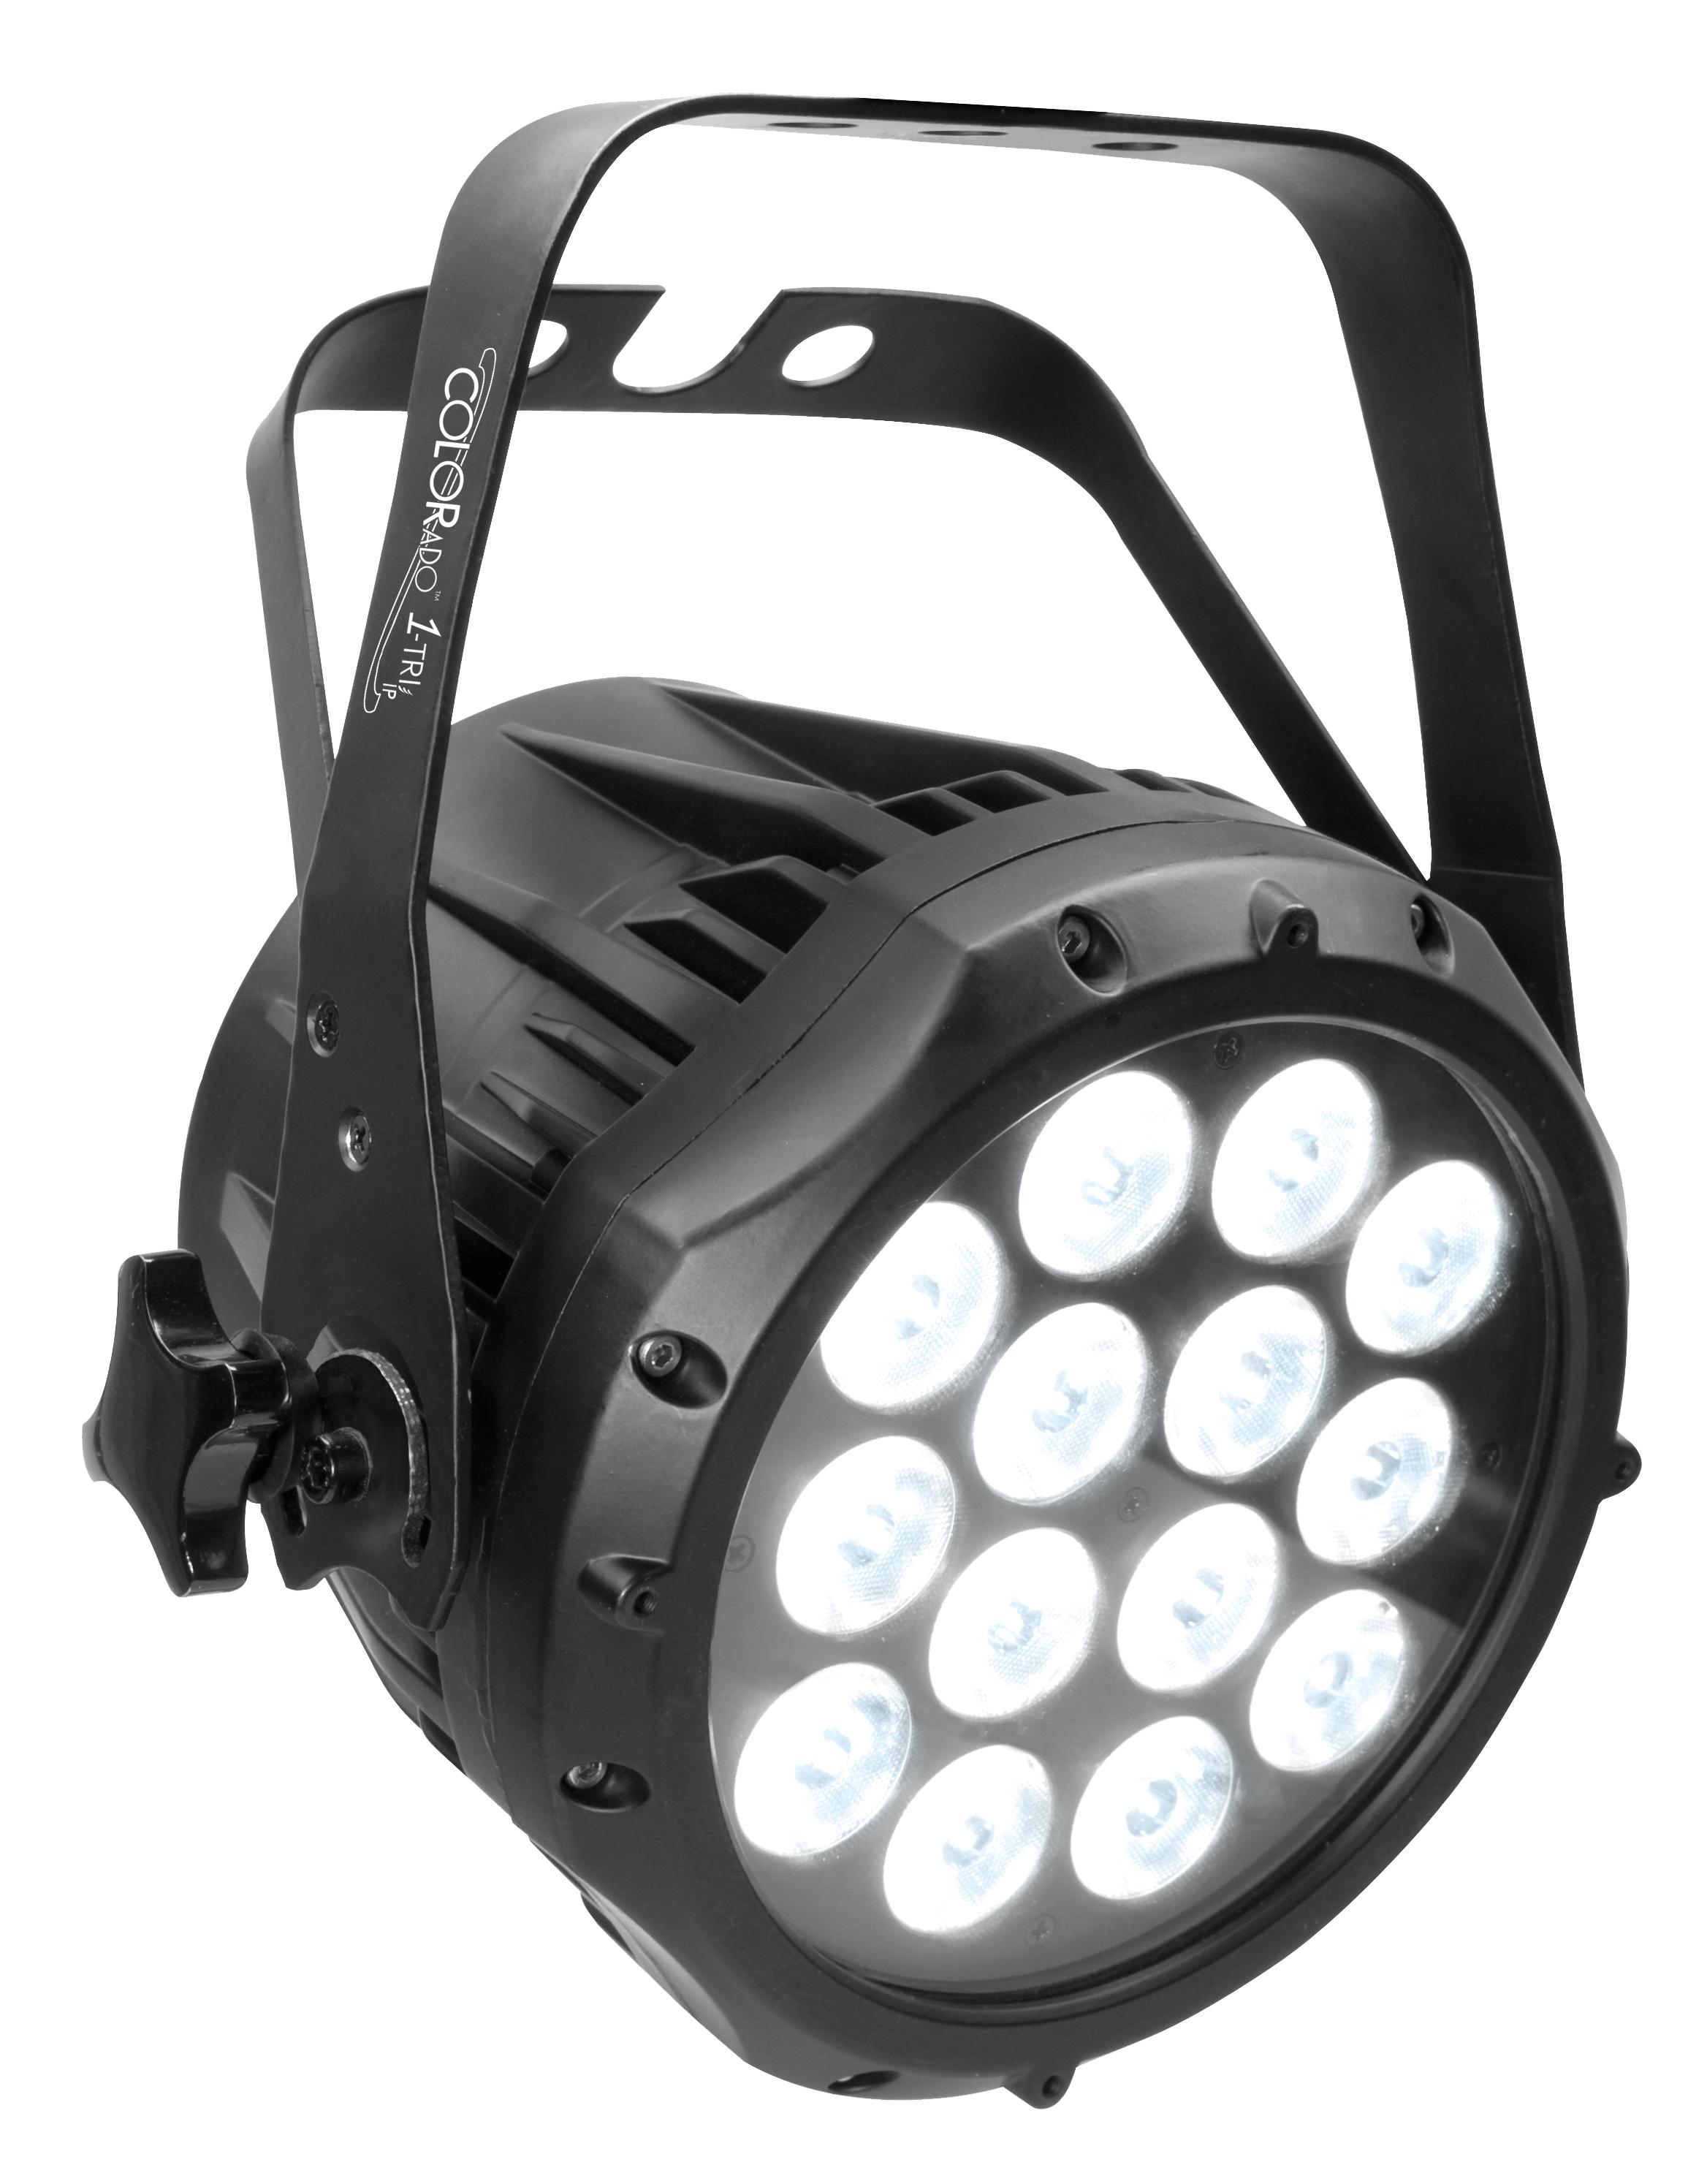 Generic LED Fixtures